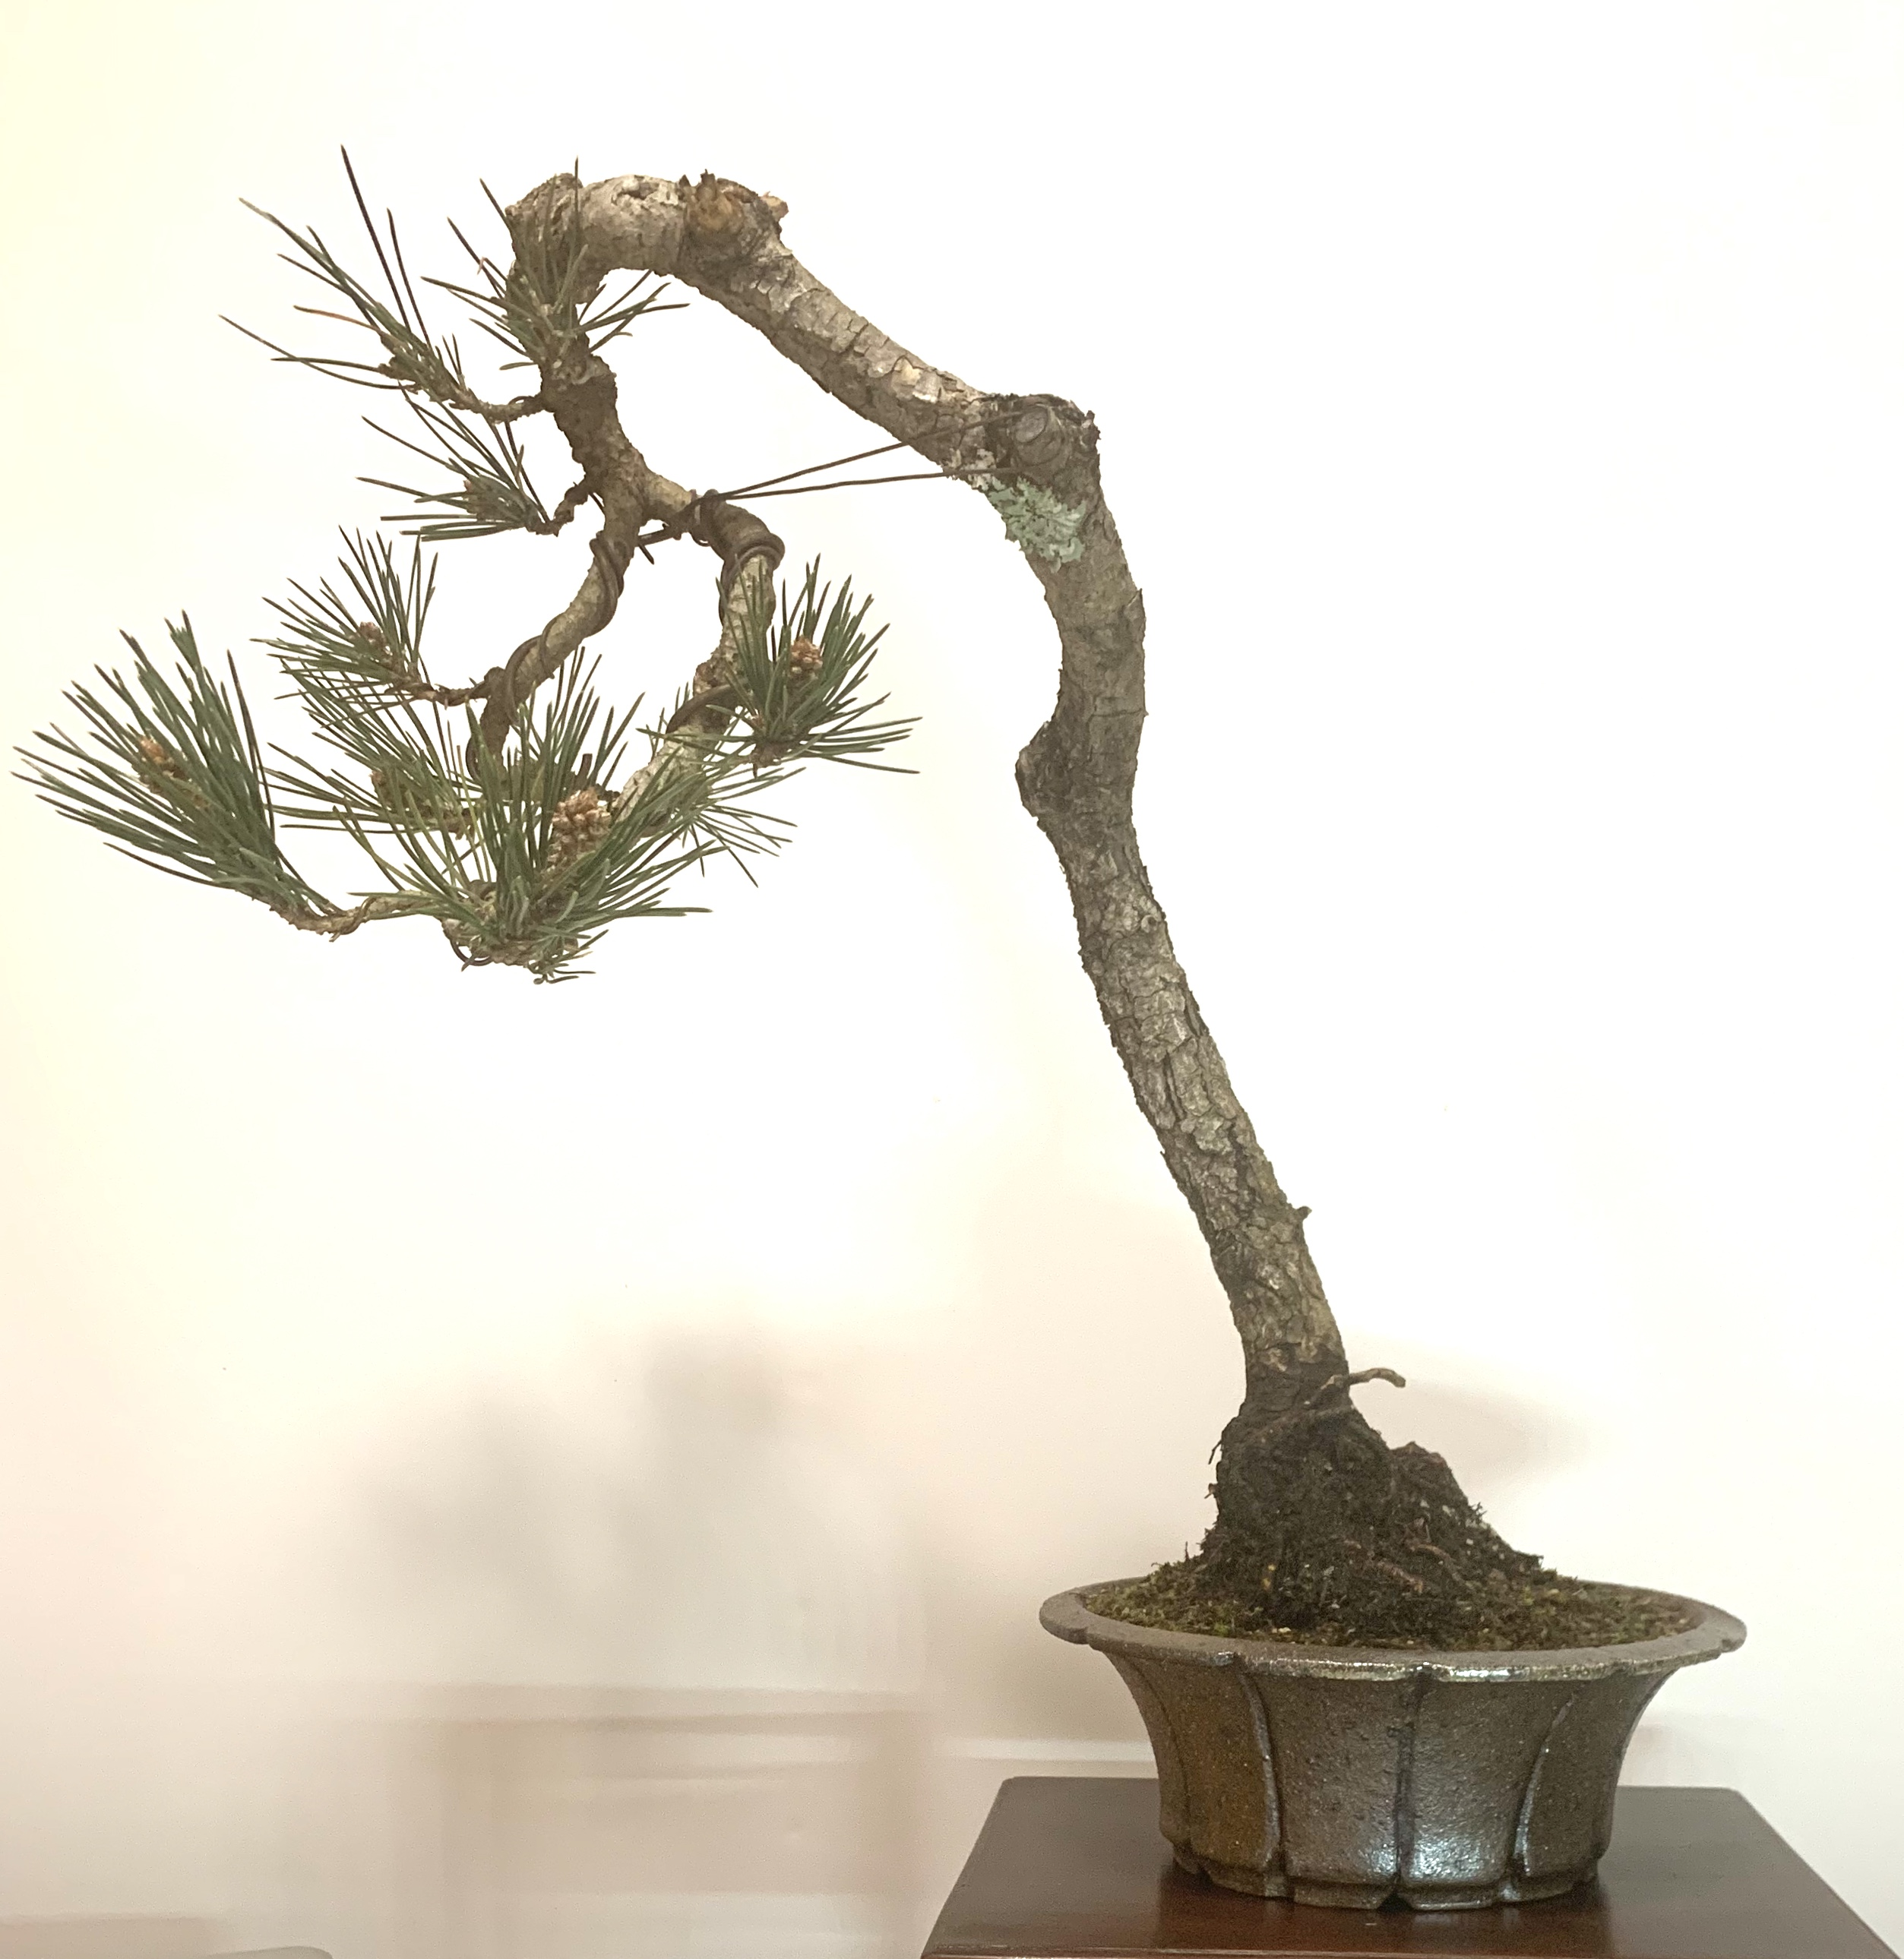 Peter J's Pine